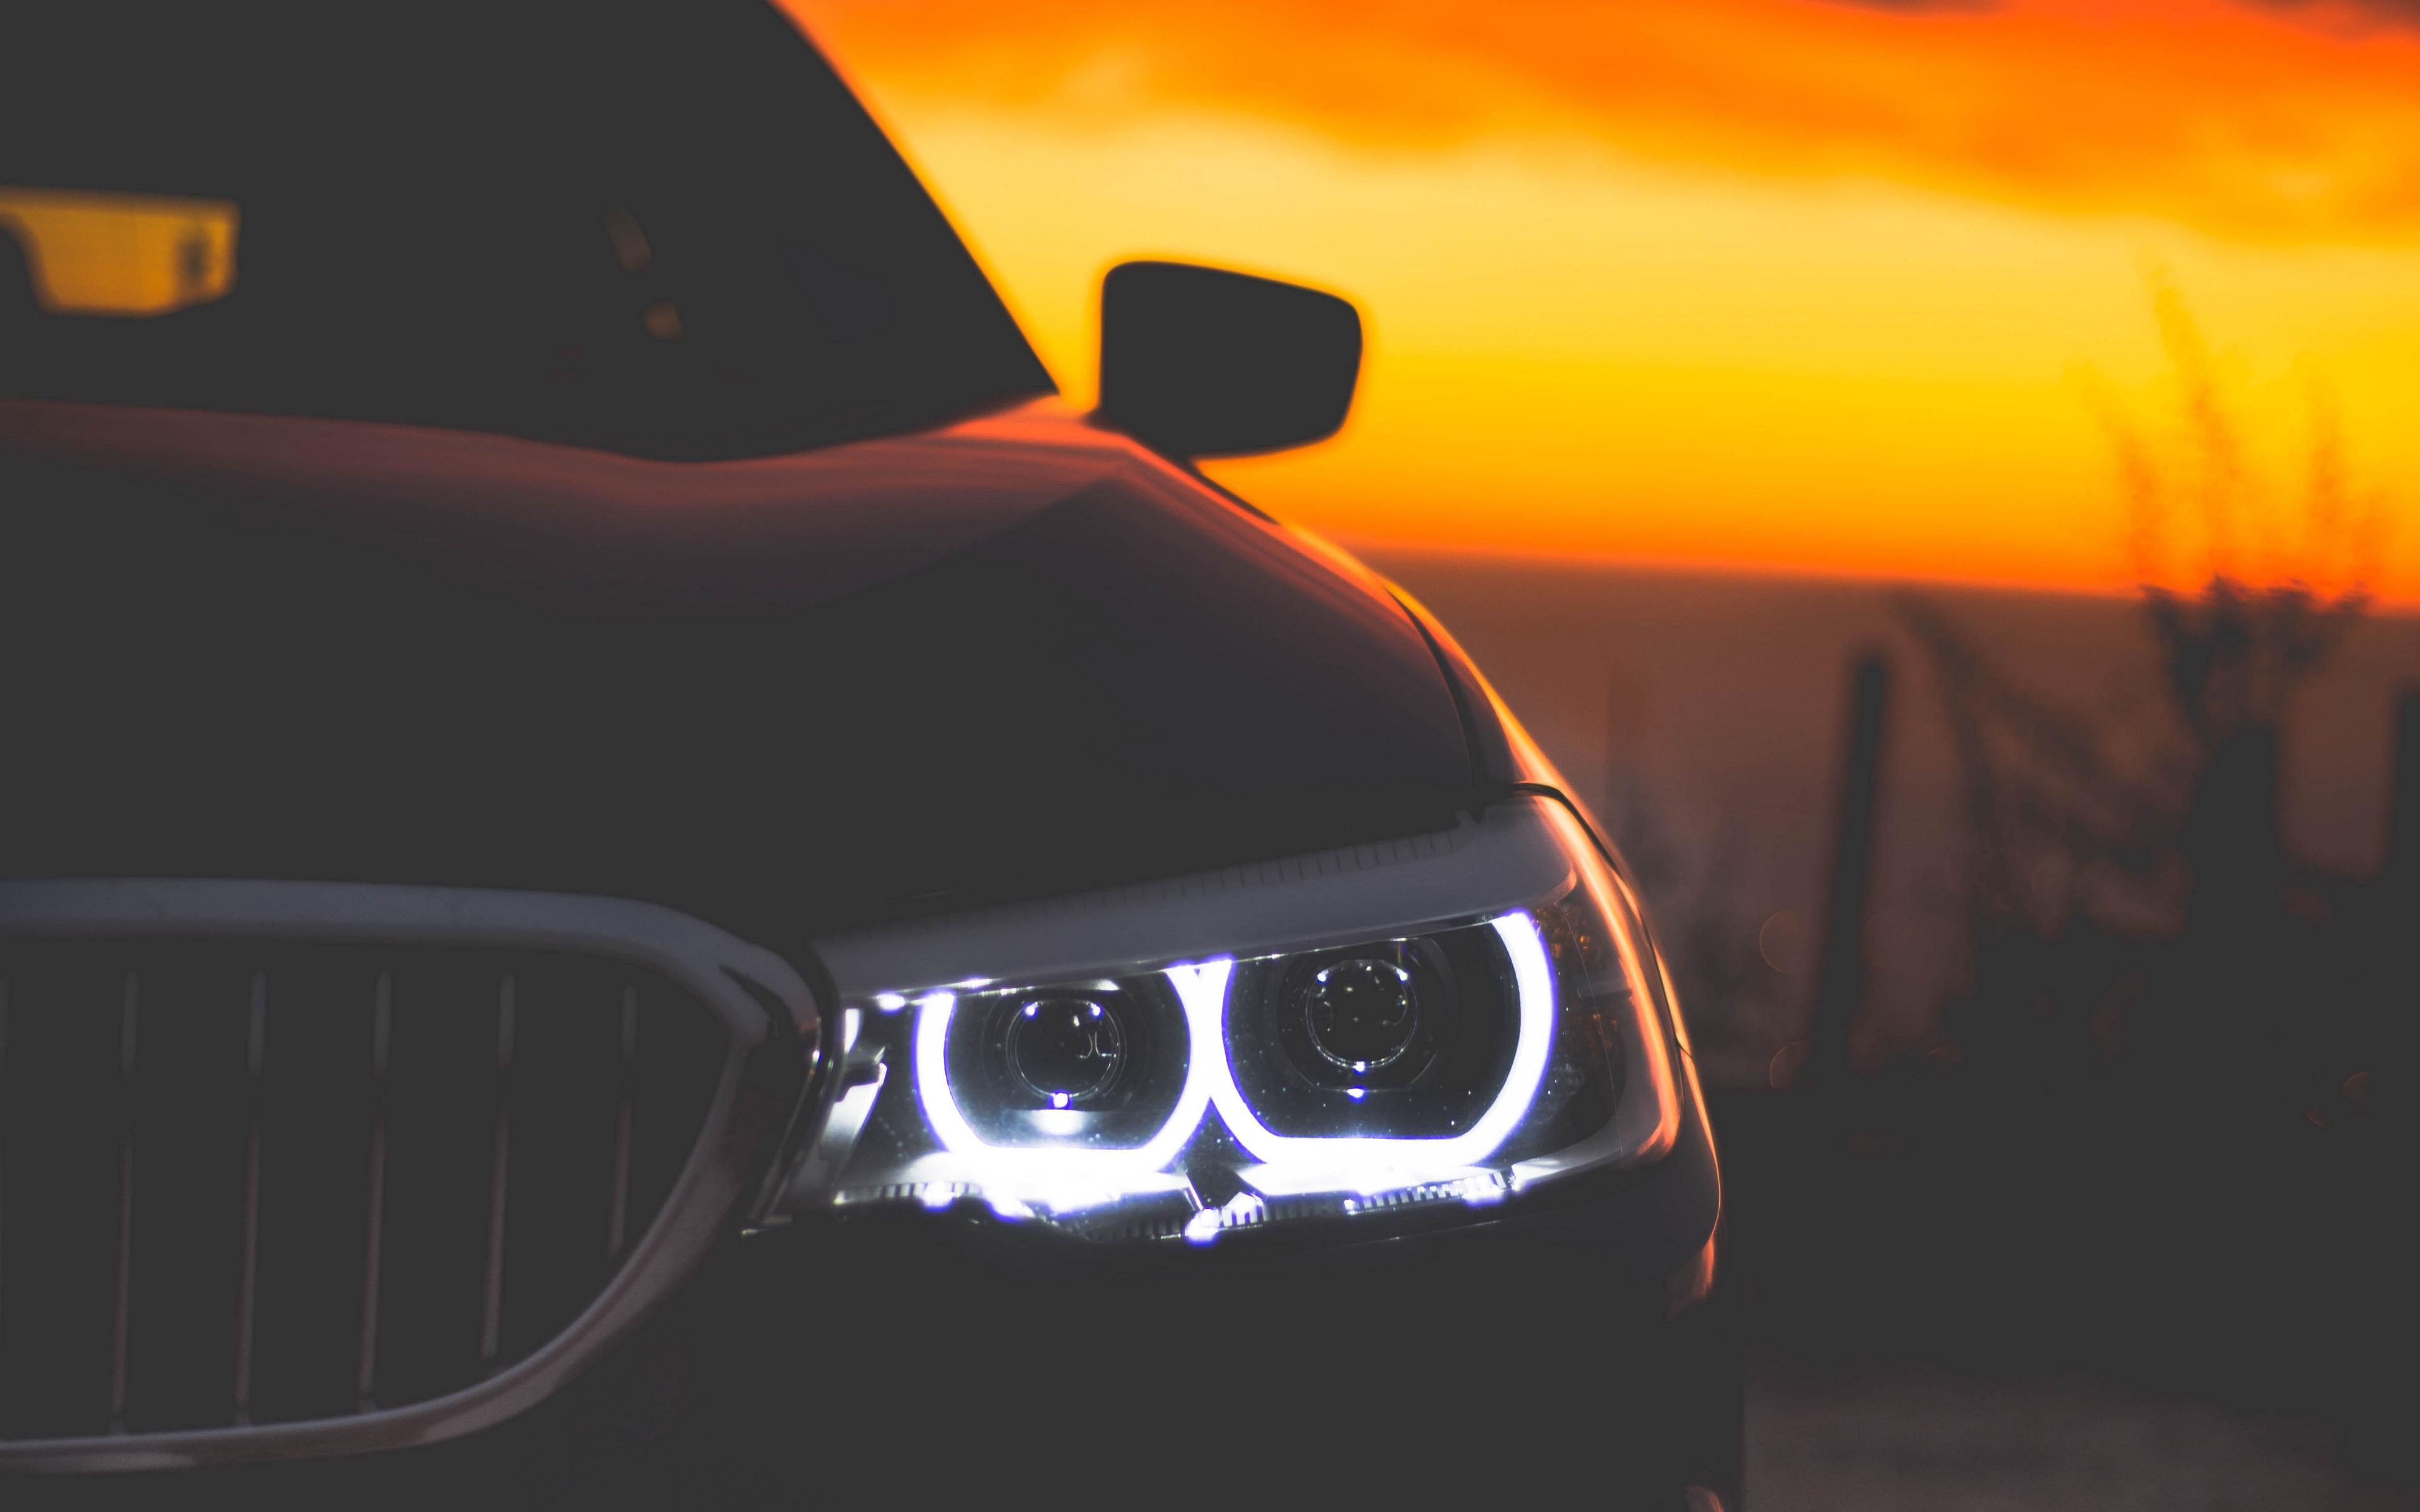 Bmw Lights 4k, HD Cars, 4k Wallpapers, Images, Backgrounds ...